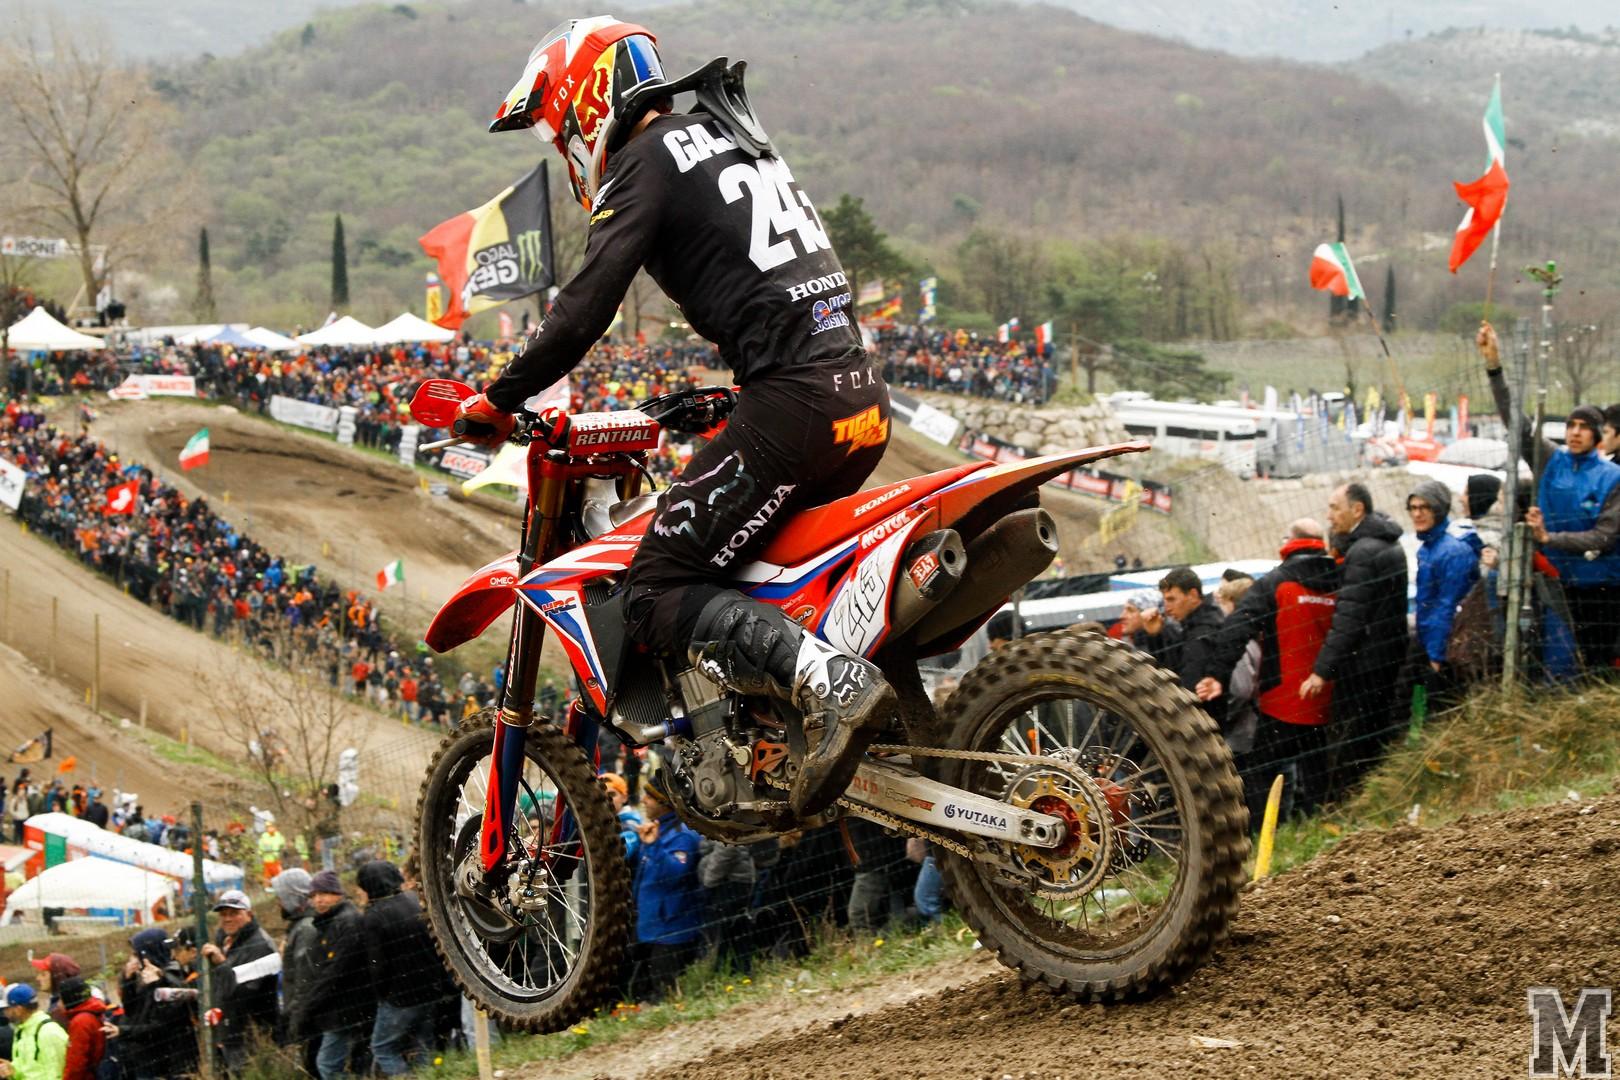 MXGP of Trentino Gajser moto 2 2019